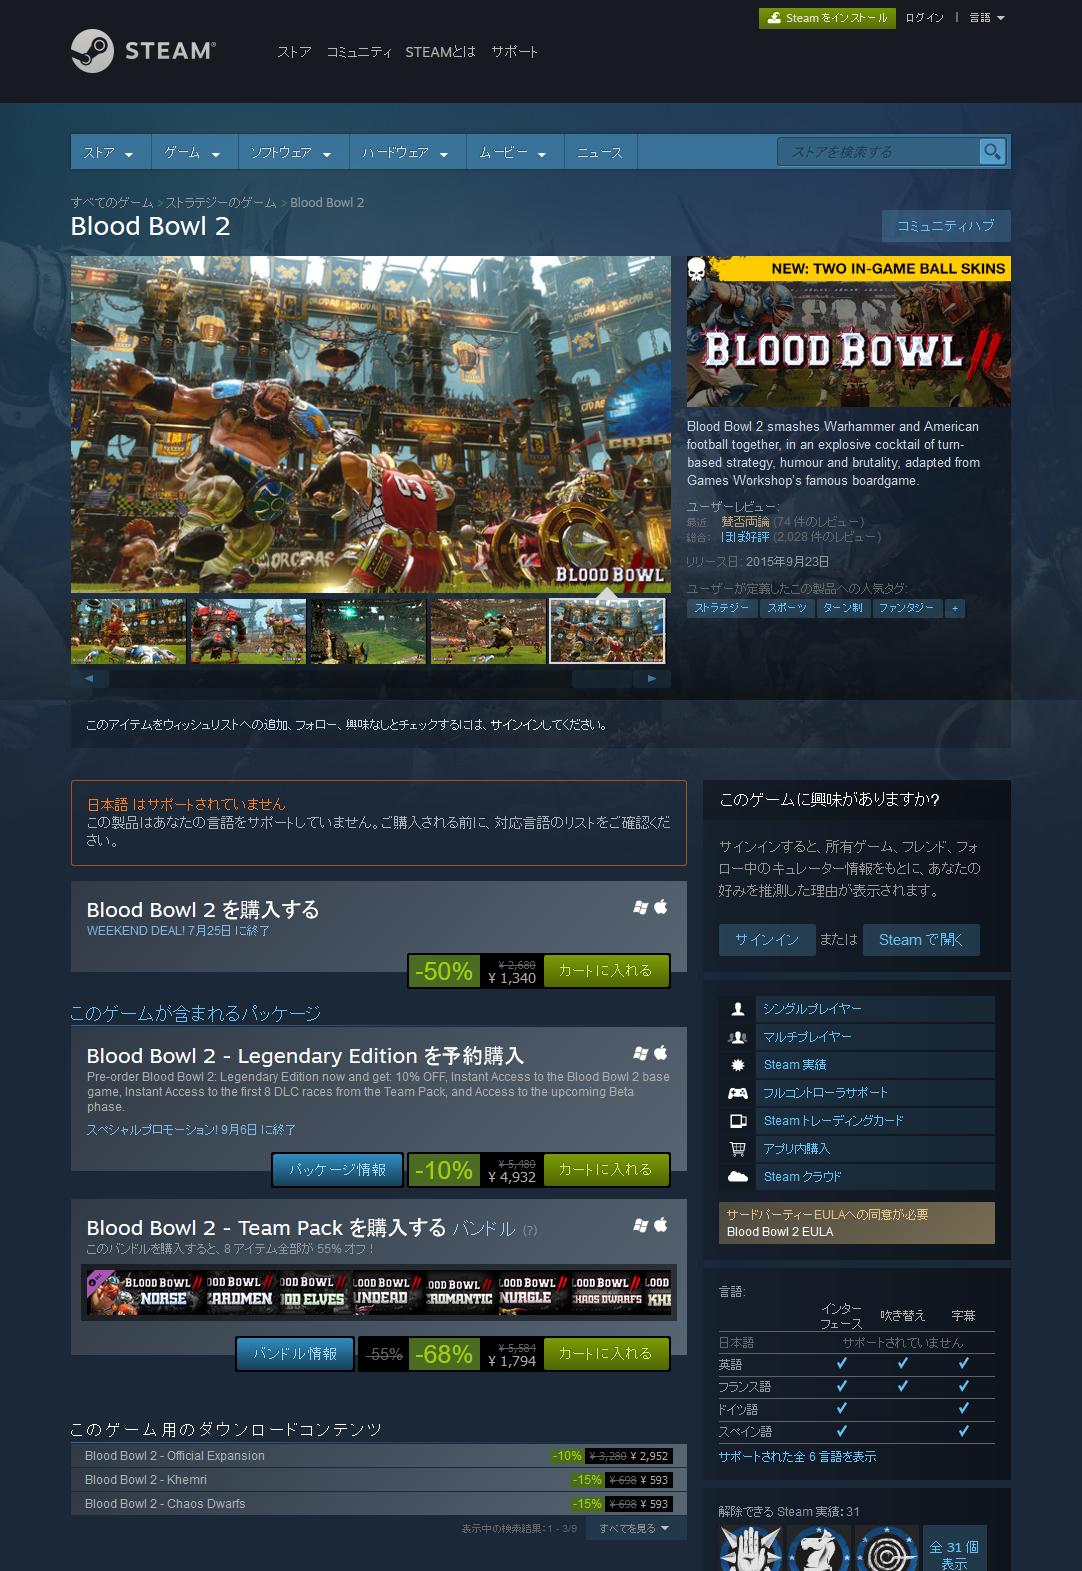 "Blood Bowl 2(<a href=""http://store.steampowered.com/app/236690/Blood_Bowl_2/"">Steamへのリンク</a>)"